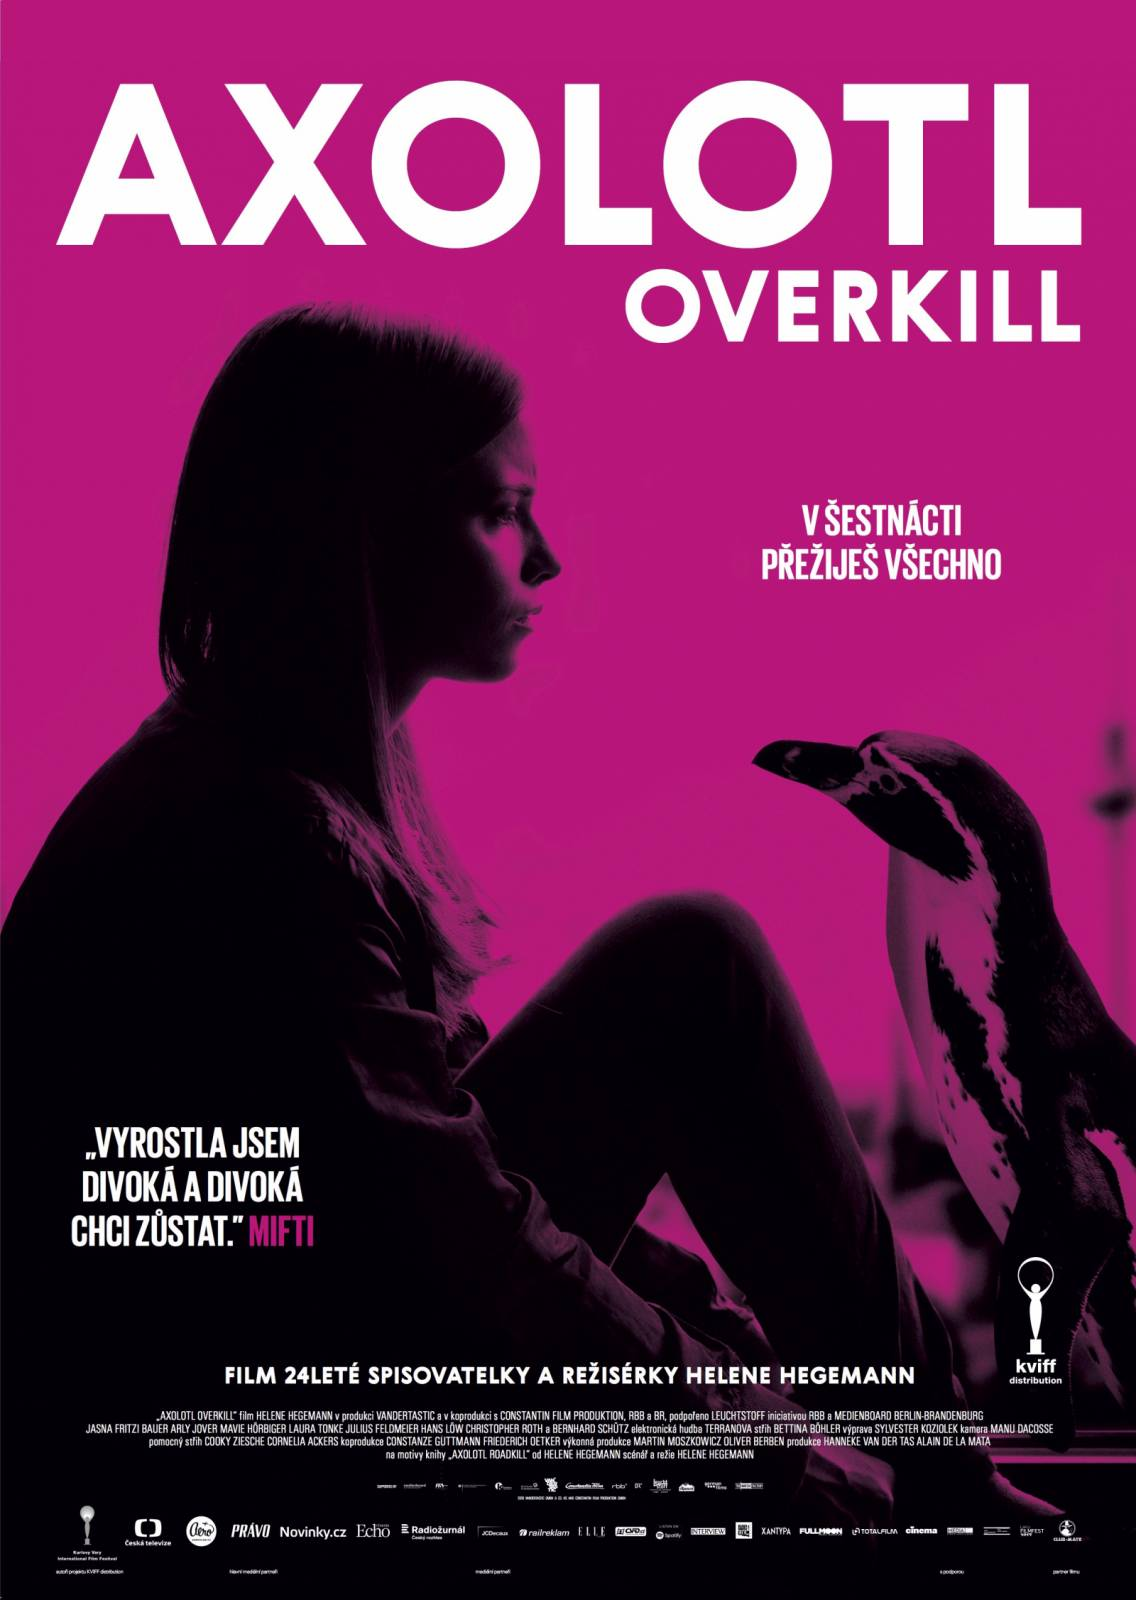 SOUTĚŽ: Premiéra filmu Axolotl Overkill